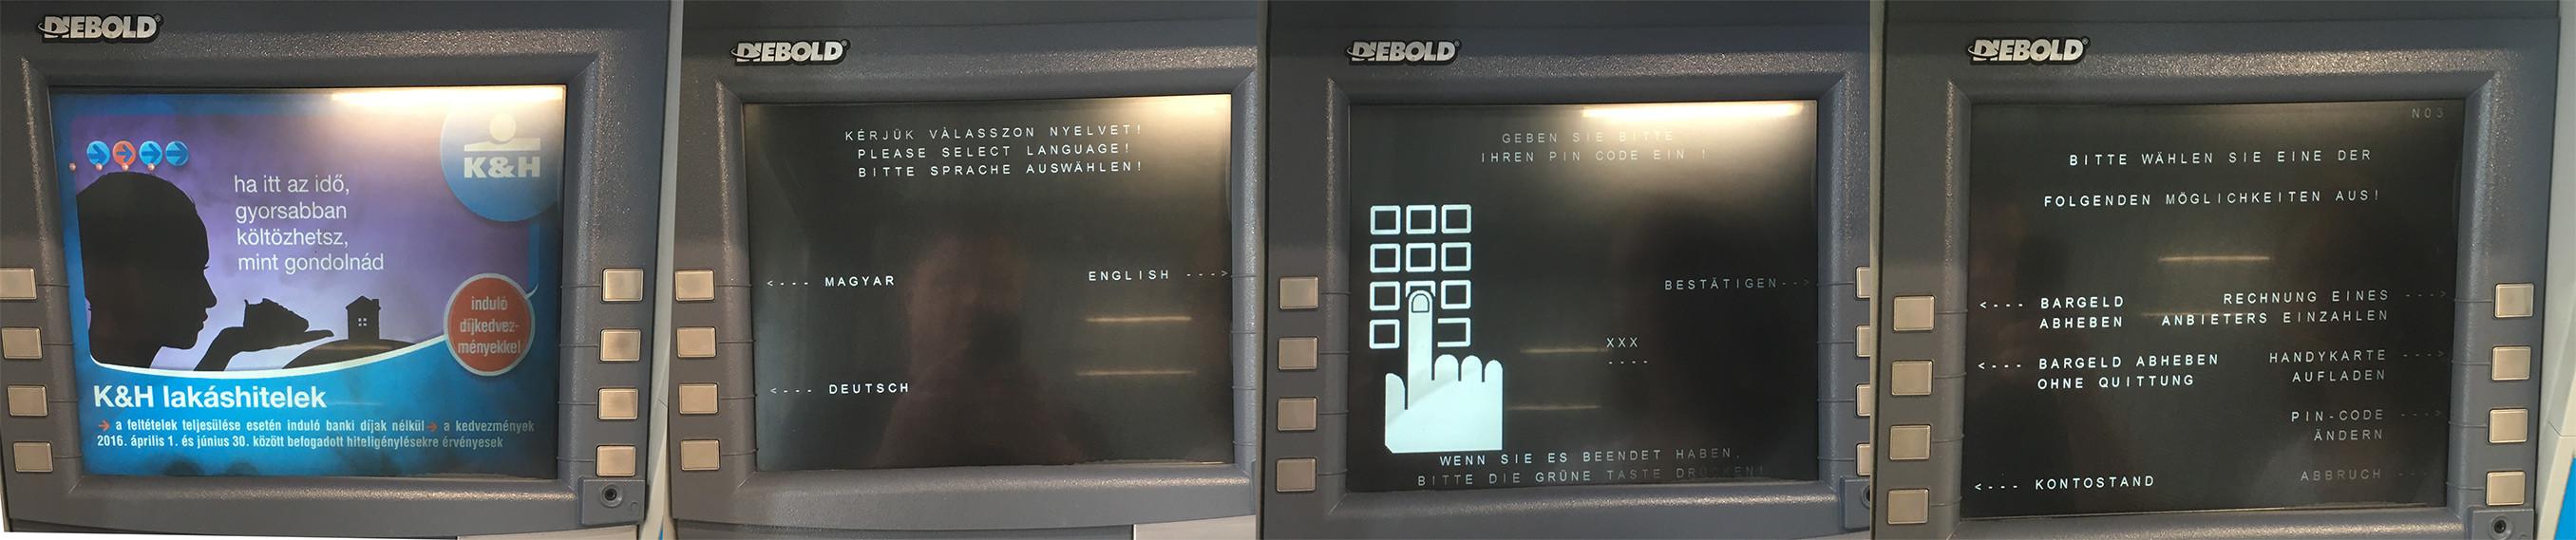 Geld abheben in Ungarn Geldautomat